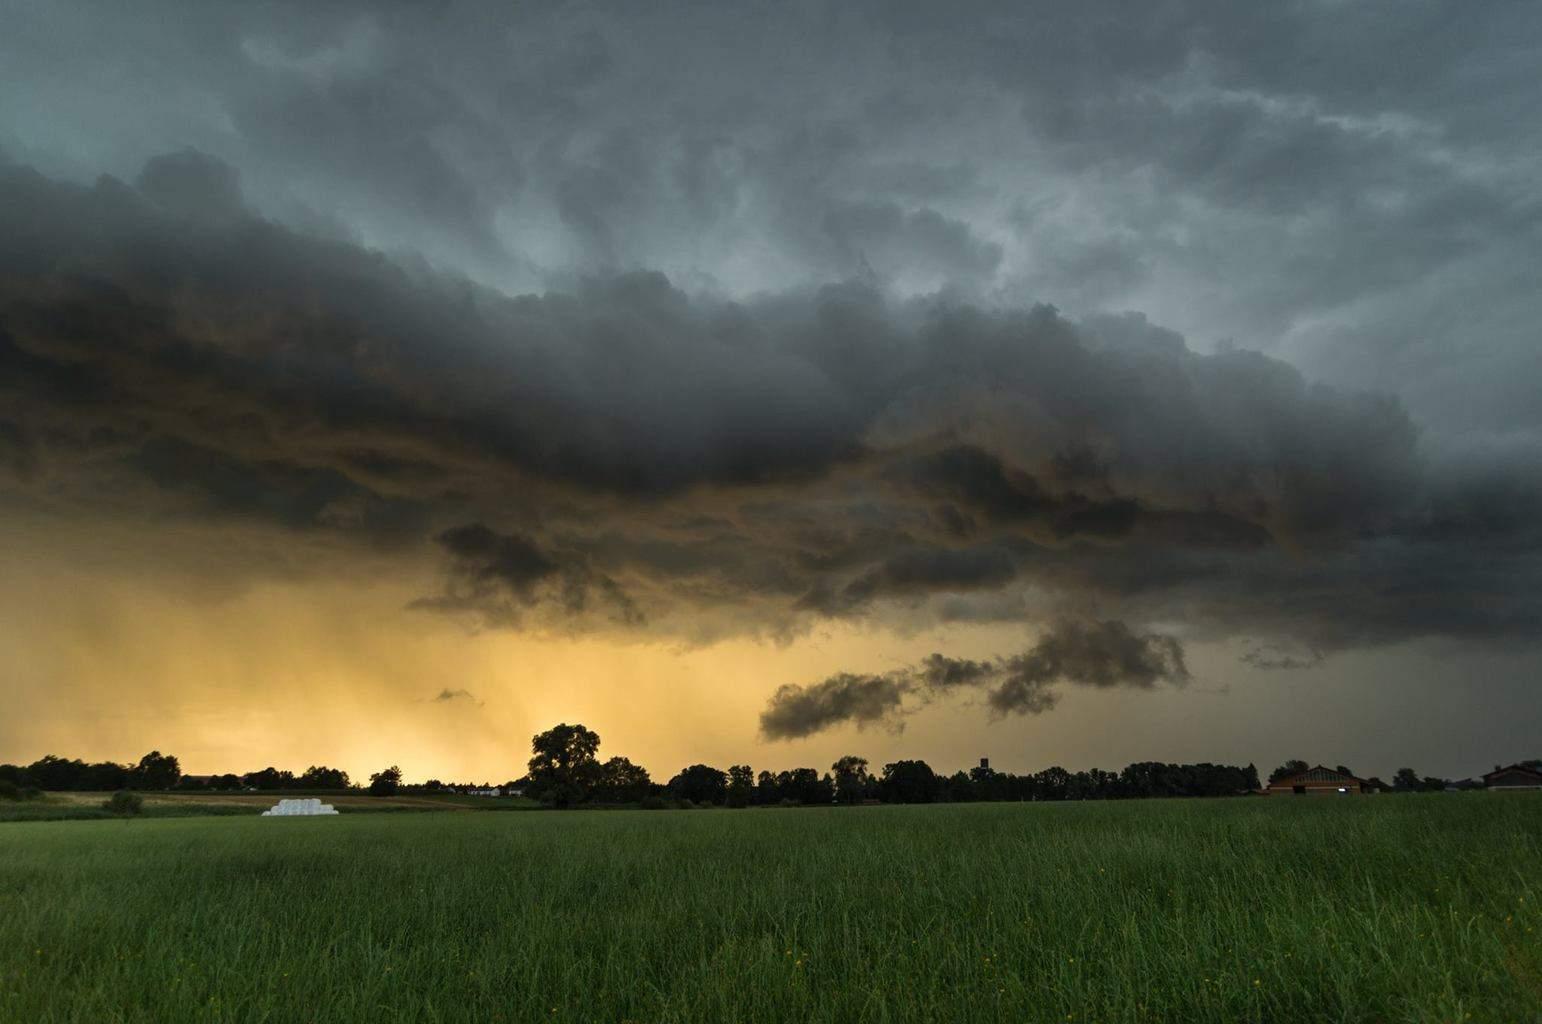 Approaching Storm - June 20, 2015